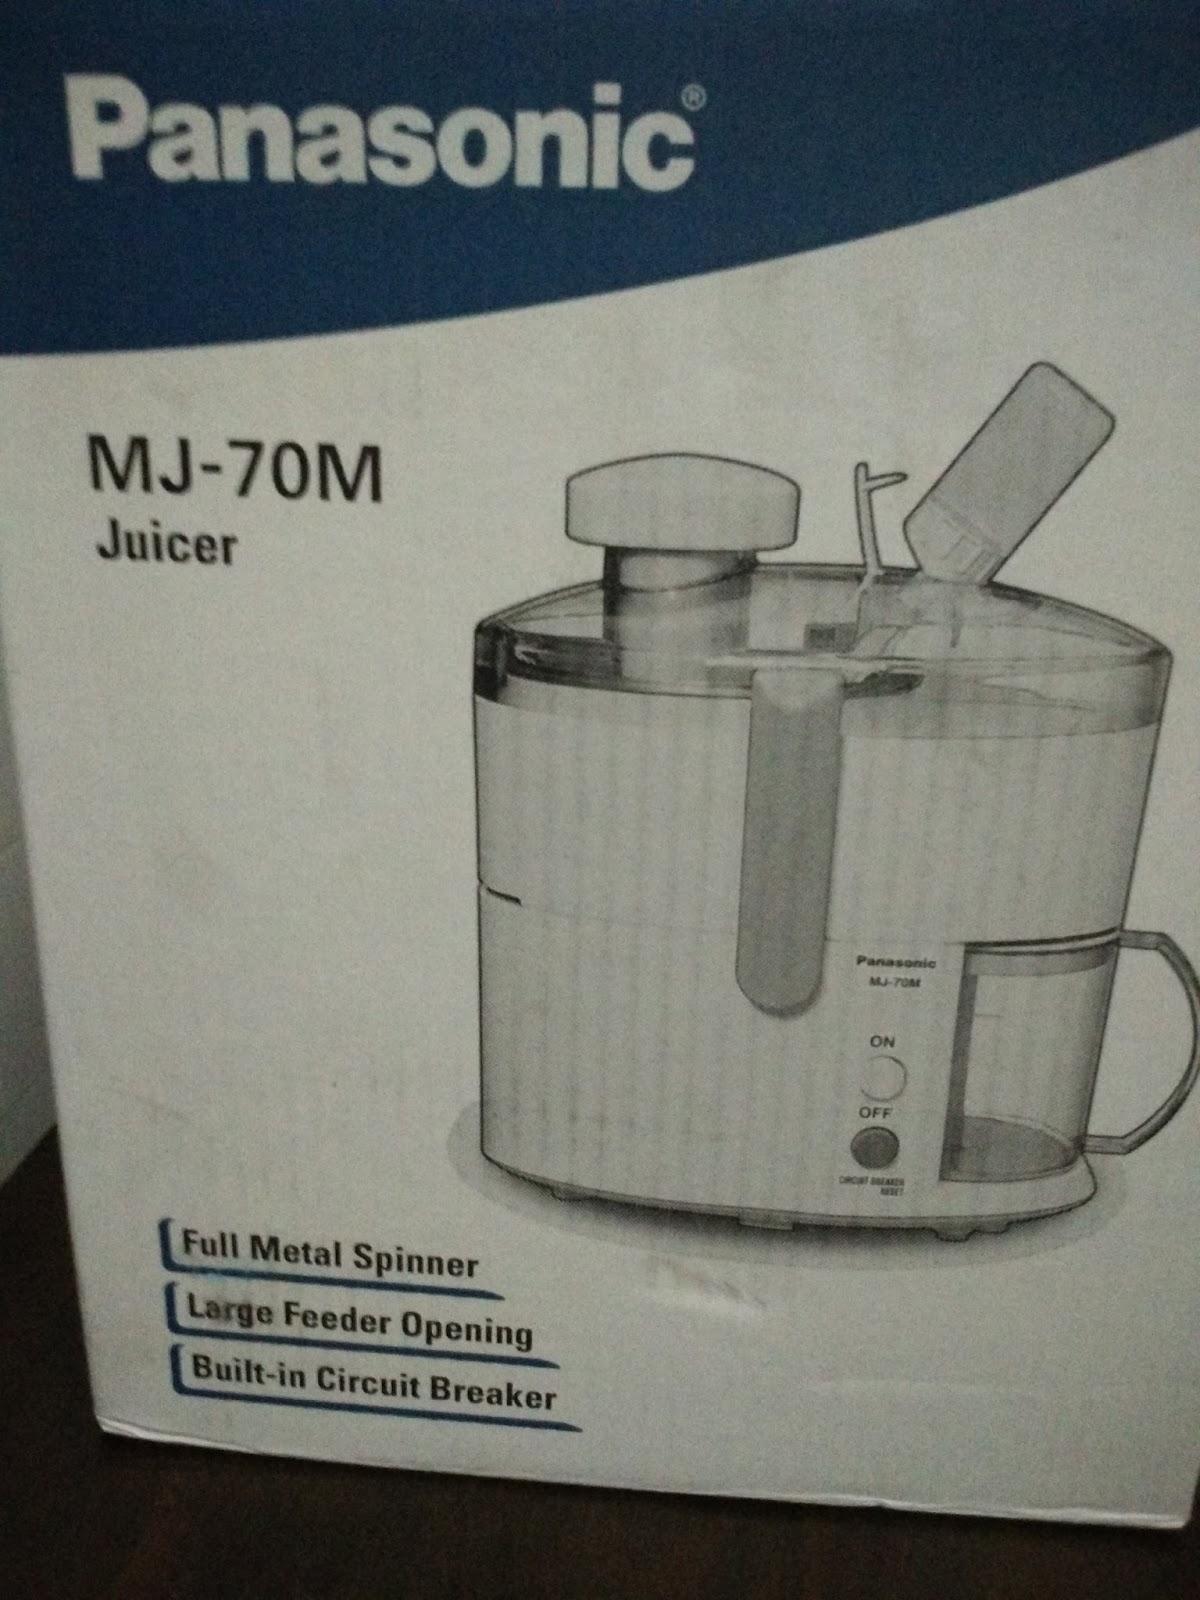 Panasonic Slow Juicer Spare Parts : PANASONIC JUICER MJ-70M-UB > Review - AURA blogger